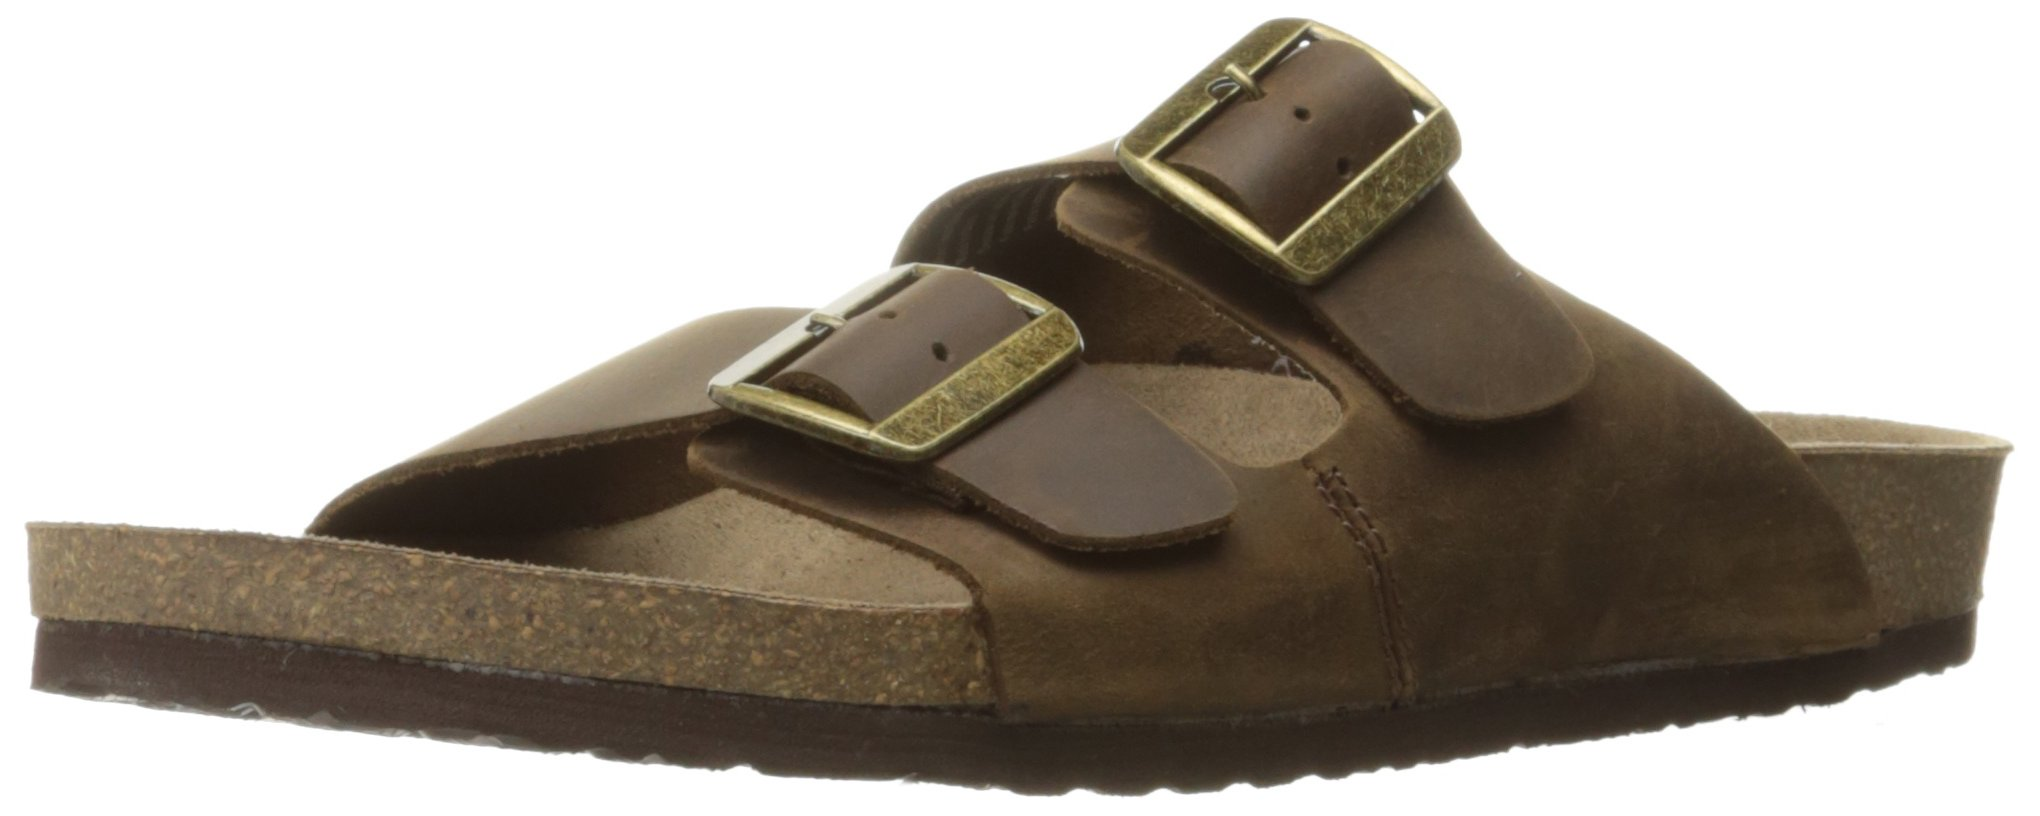 Crevo Men's Sedono Slide Sandal, Brown, 10 M US